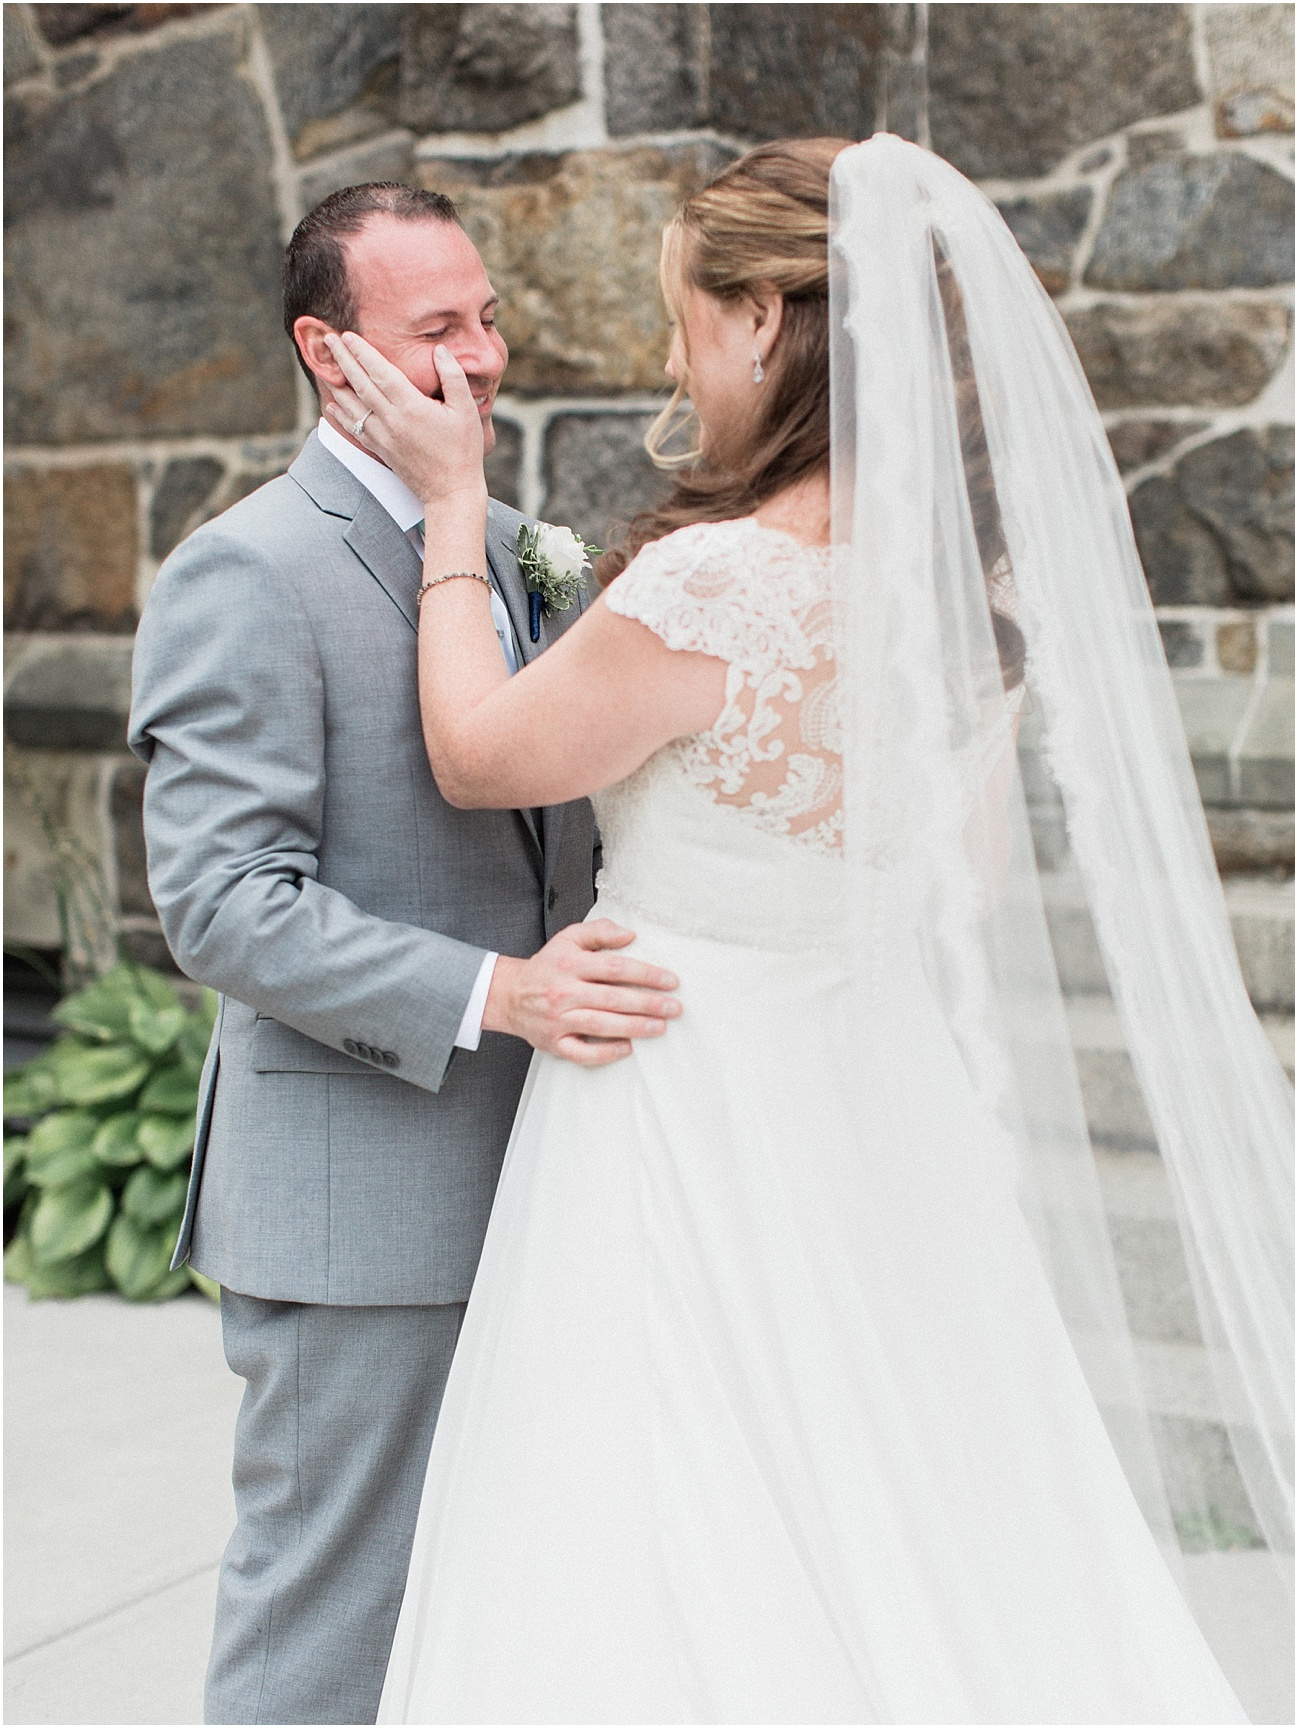 jaclyn_adam_st_ann_brendans_dorchester_southie_castle_bride_groom_venezia_waterfront__cape_cod_boston_wedding_photographer_meredith_jane_photography_photo_0895.jpg